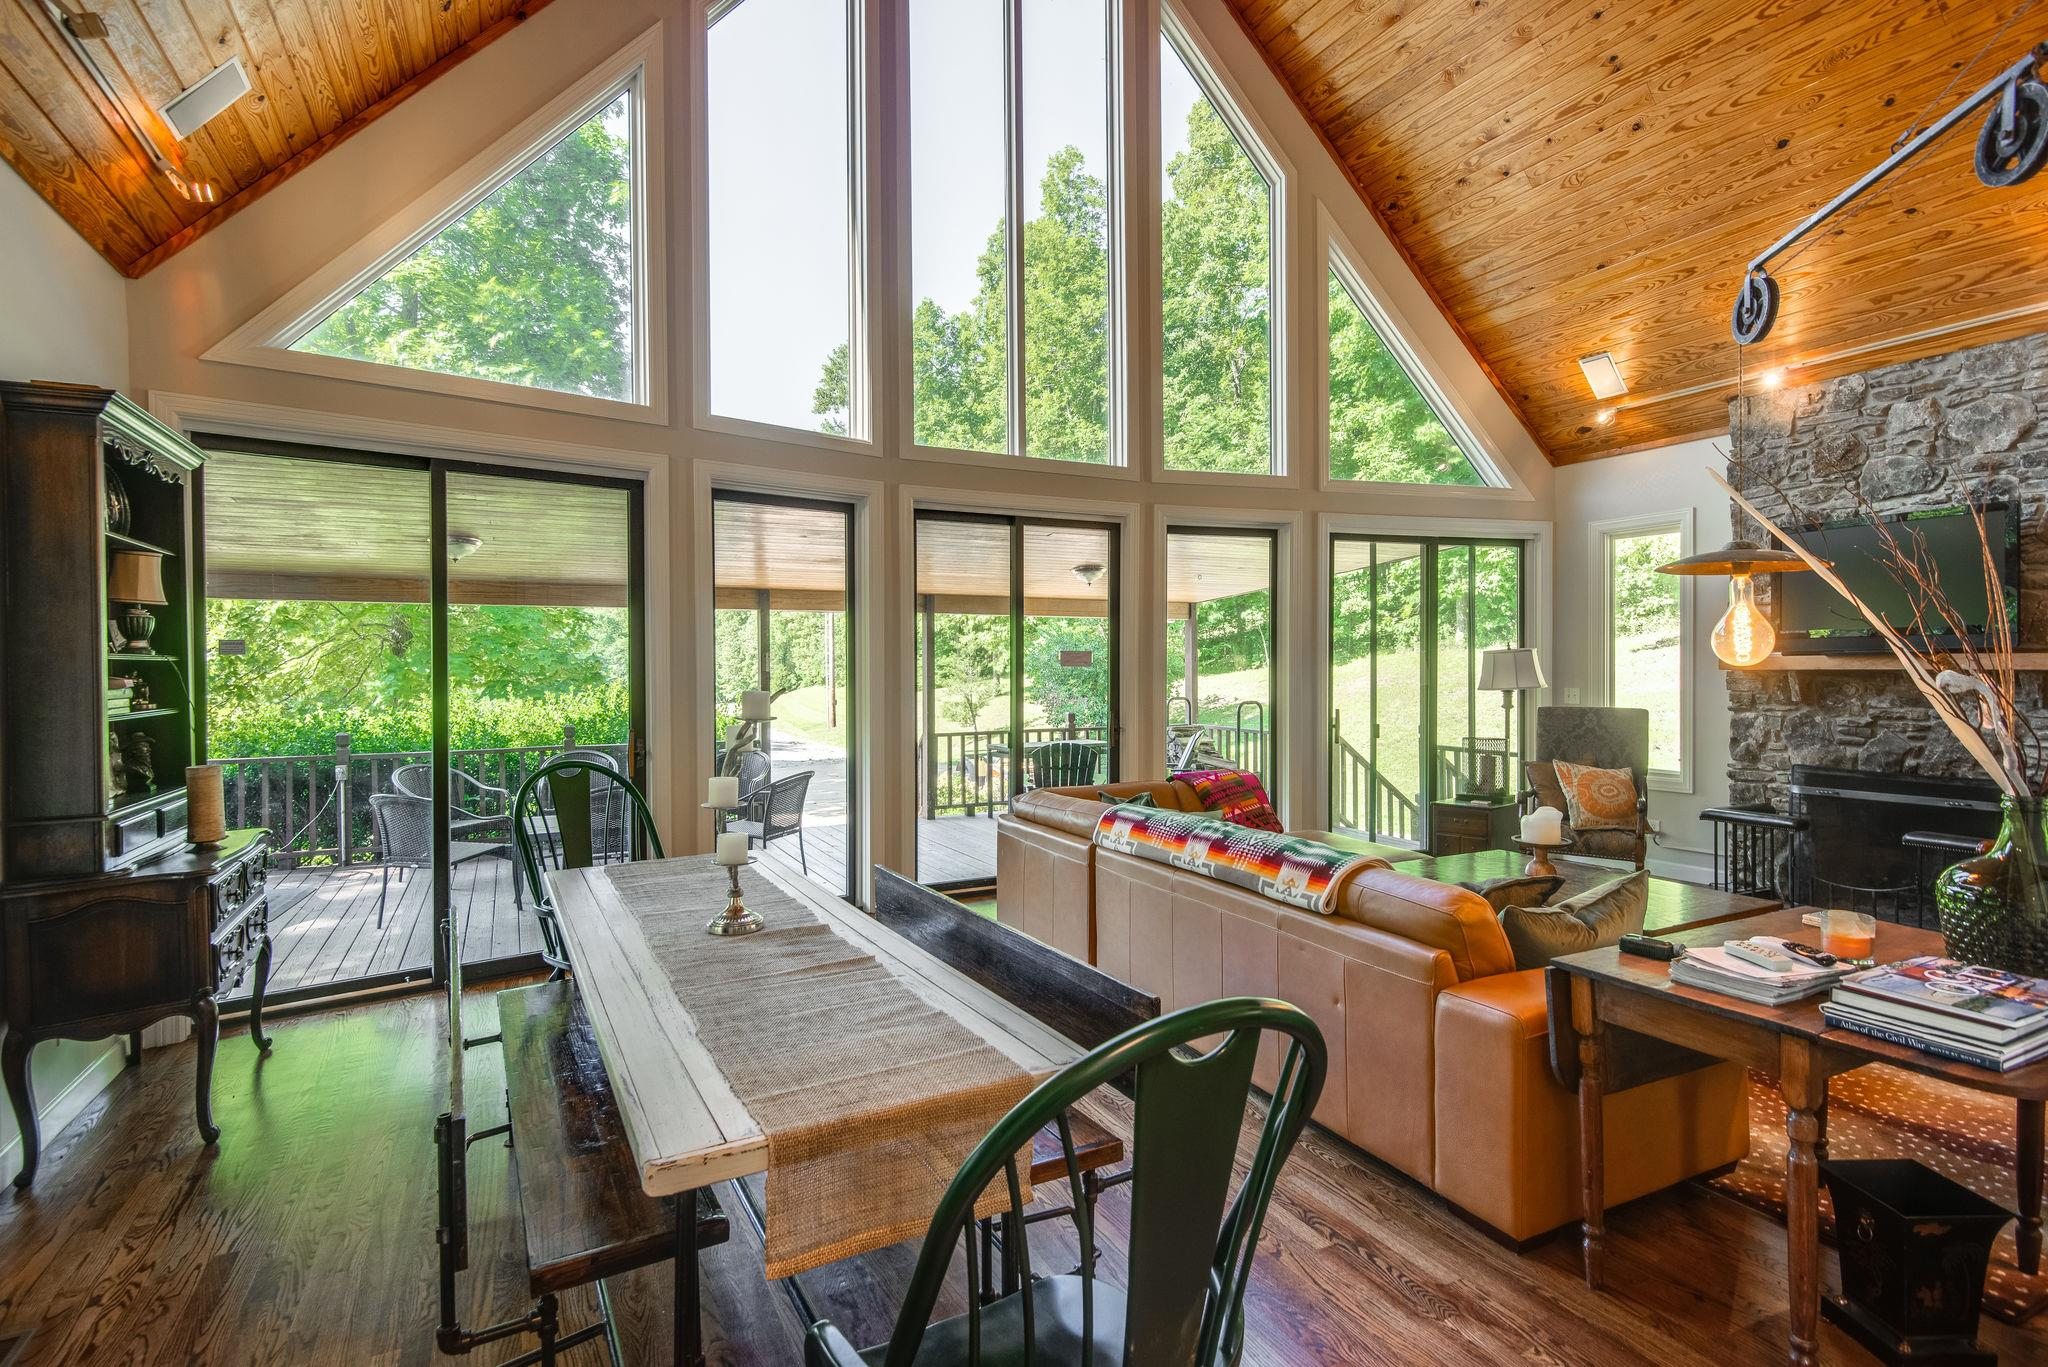 342 Napier Rd, Hohenwald, TN 38462 - Hohenwald, TN real estate listing